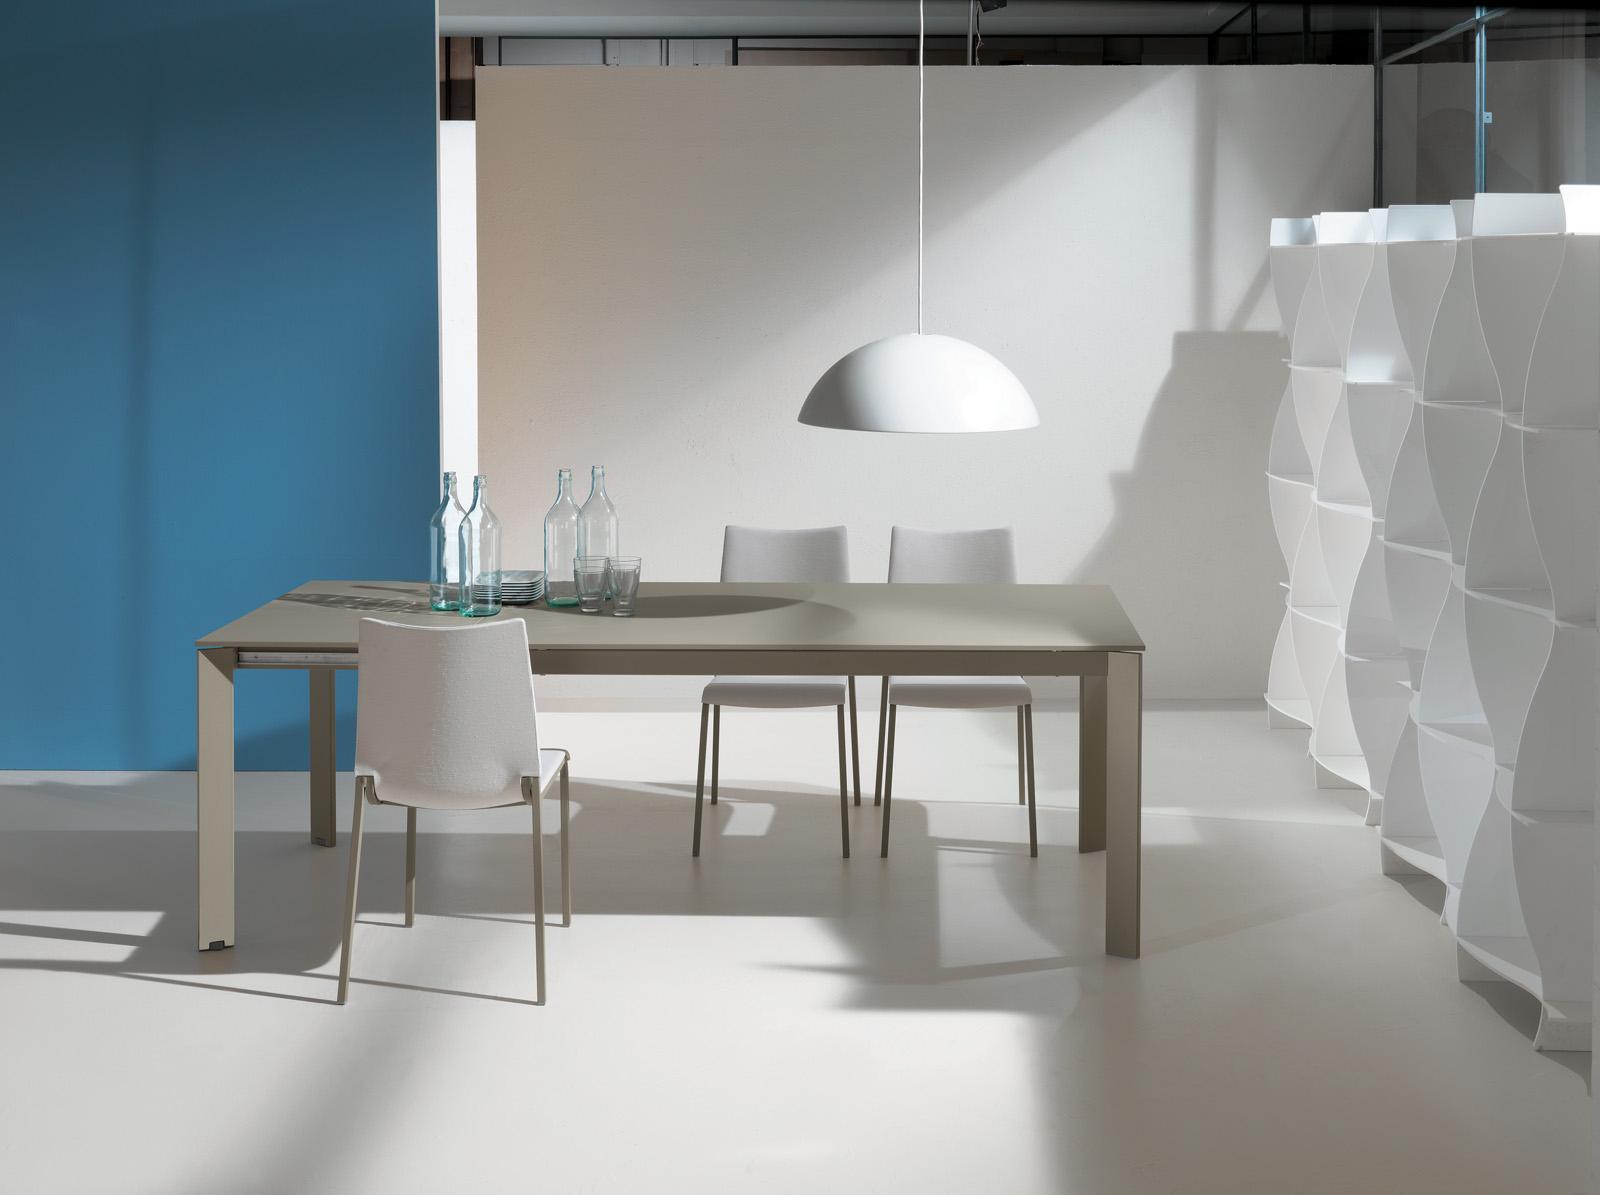 Bontempi tavolo niko sedia eva libreria wave for Mobili eva arredamenti